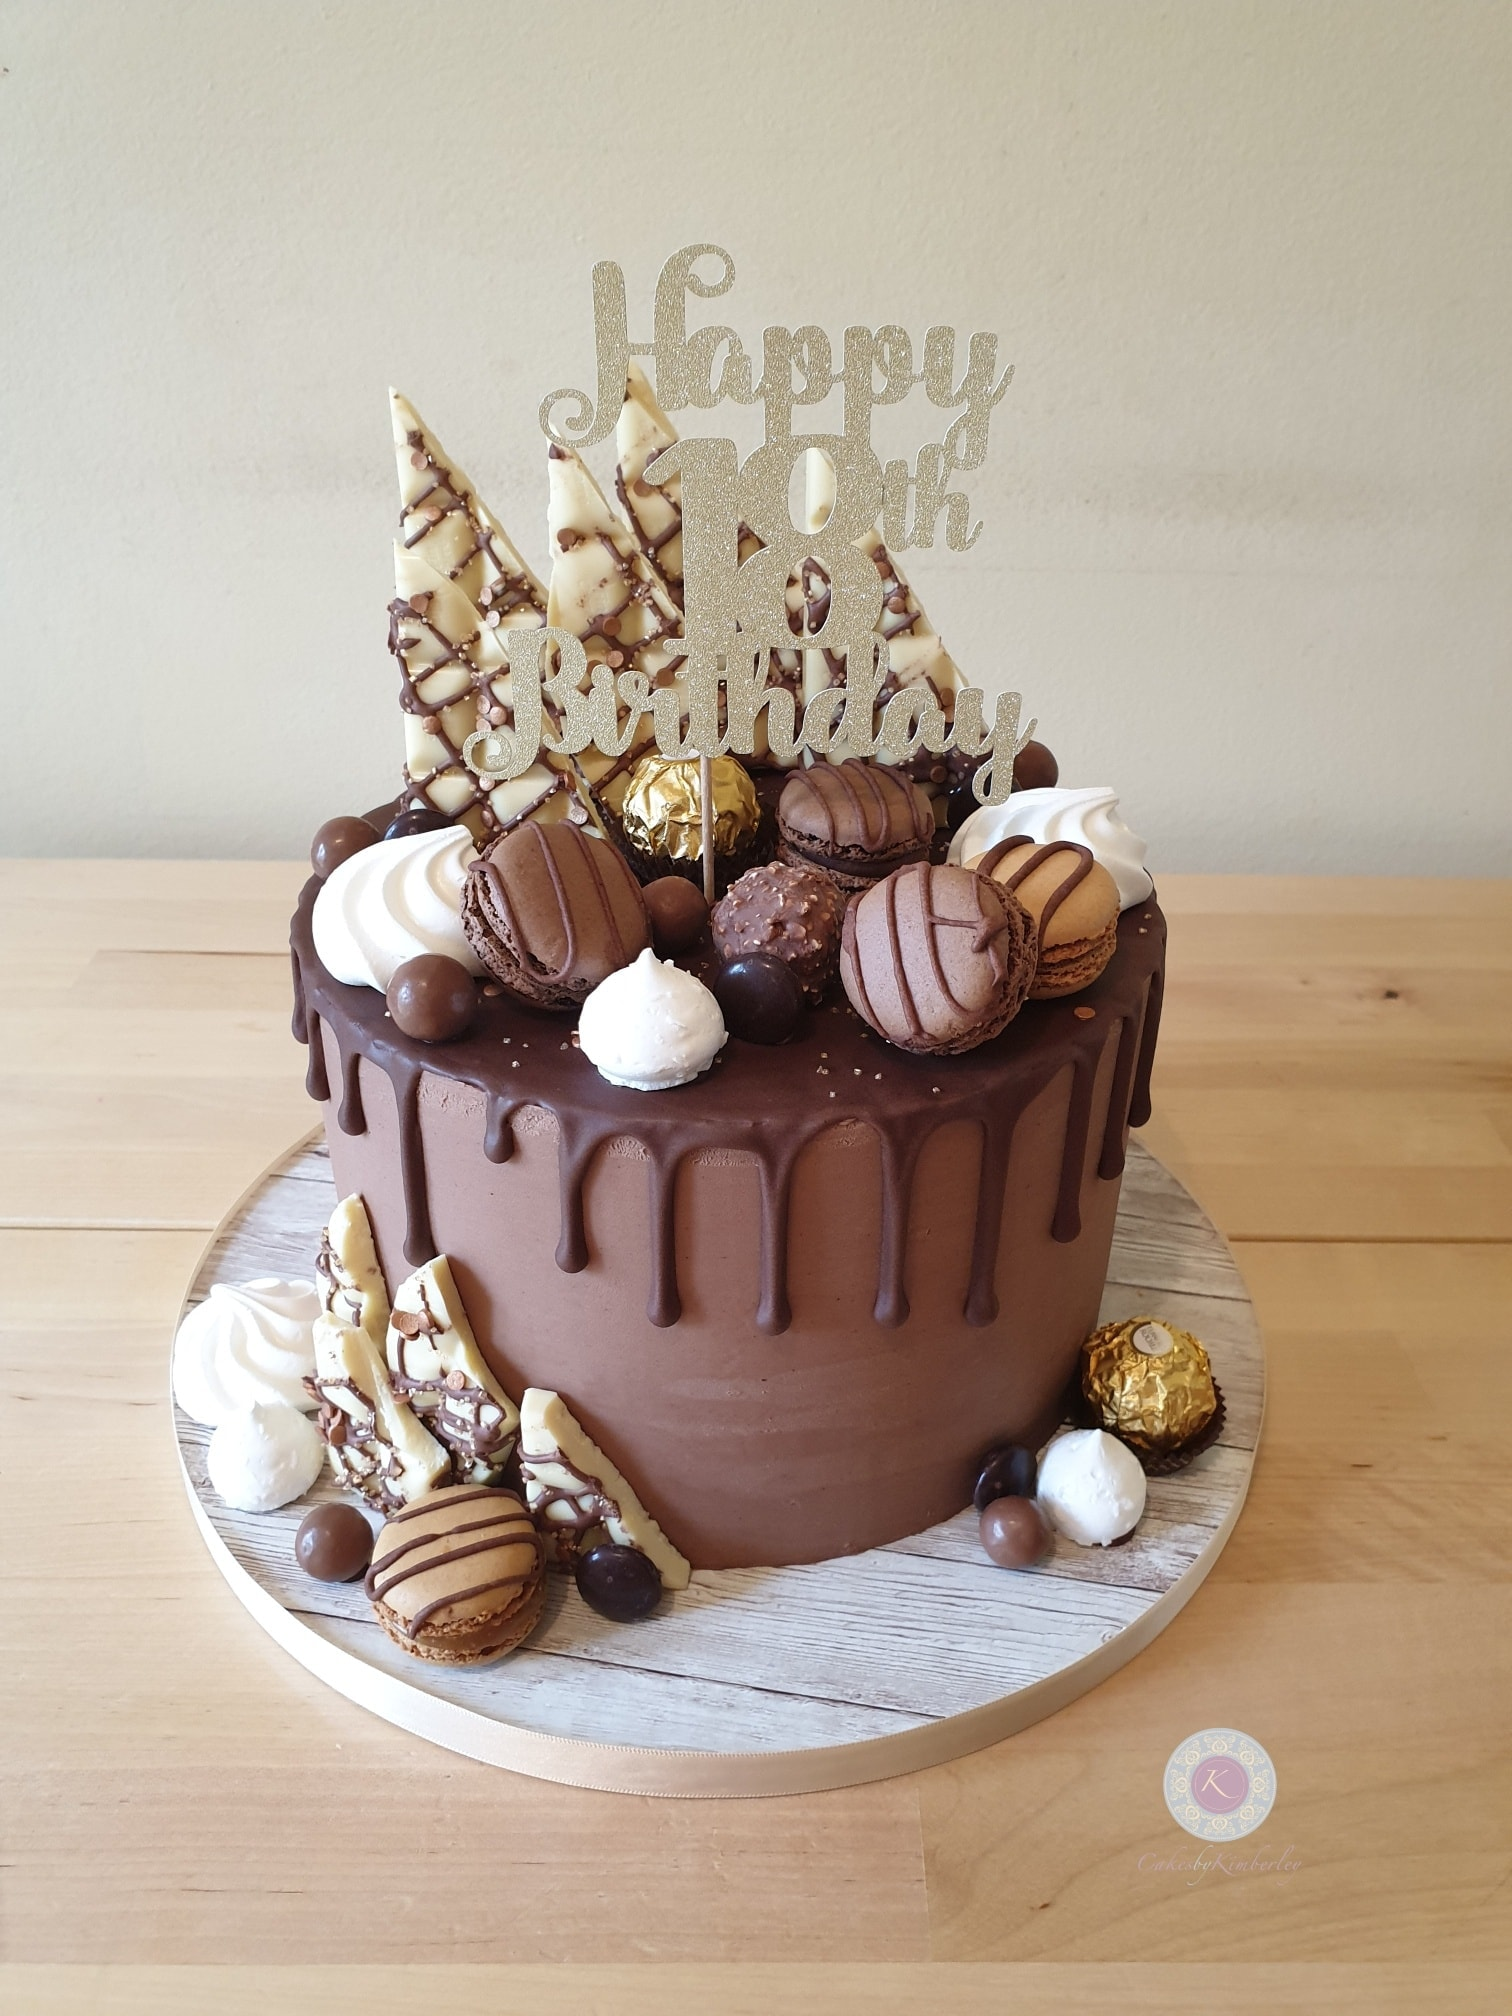 Drip cake - chocolate 18th